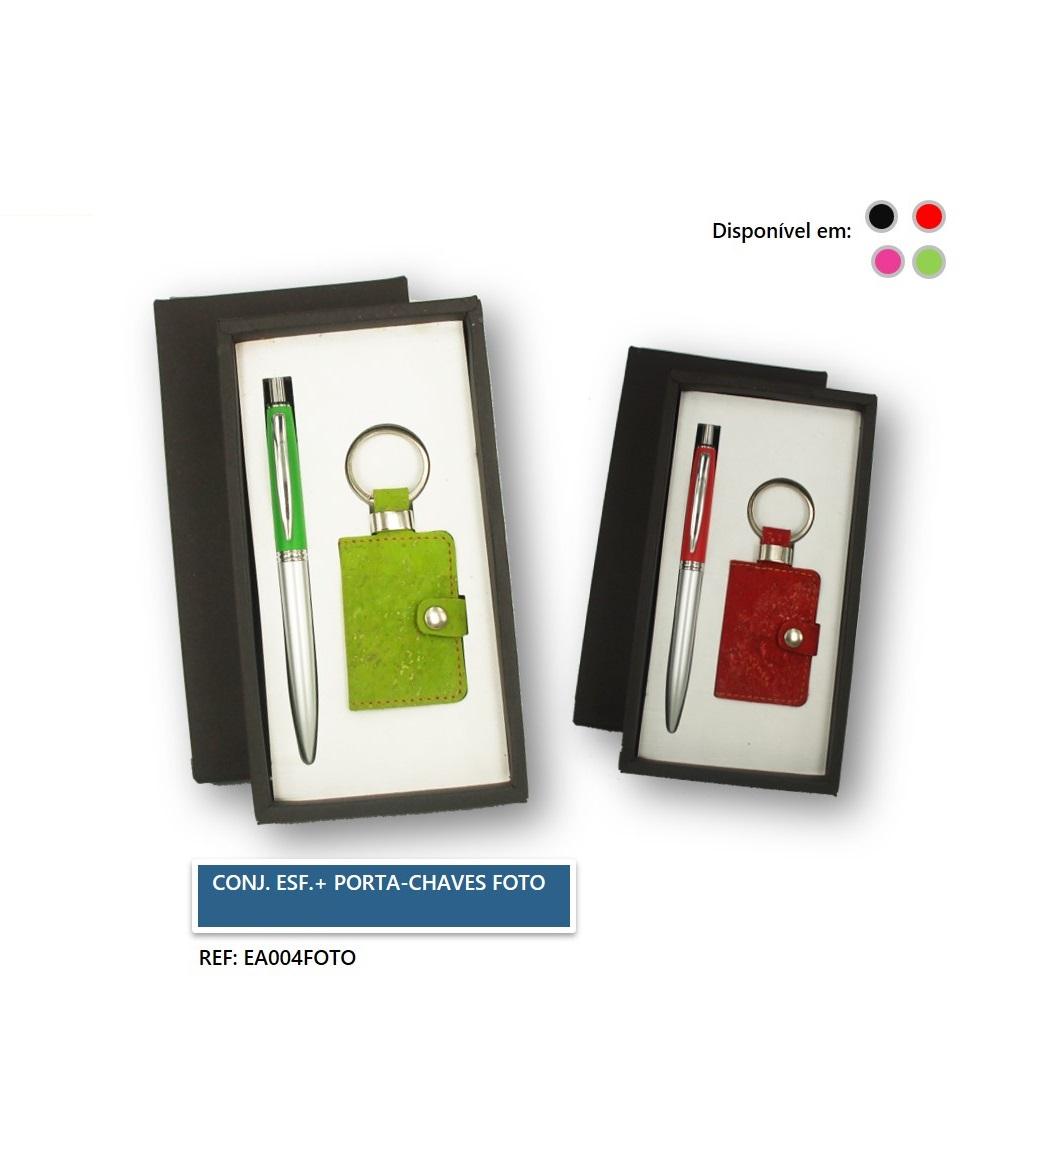 Conjunto Esferográfica + Porta-chaves Foto